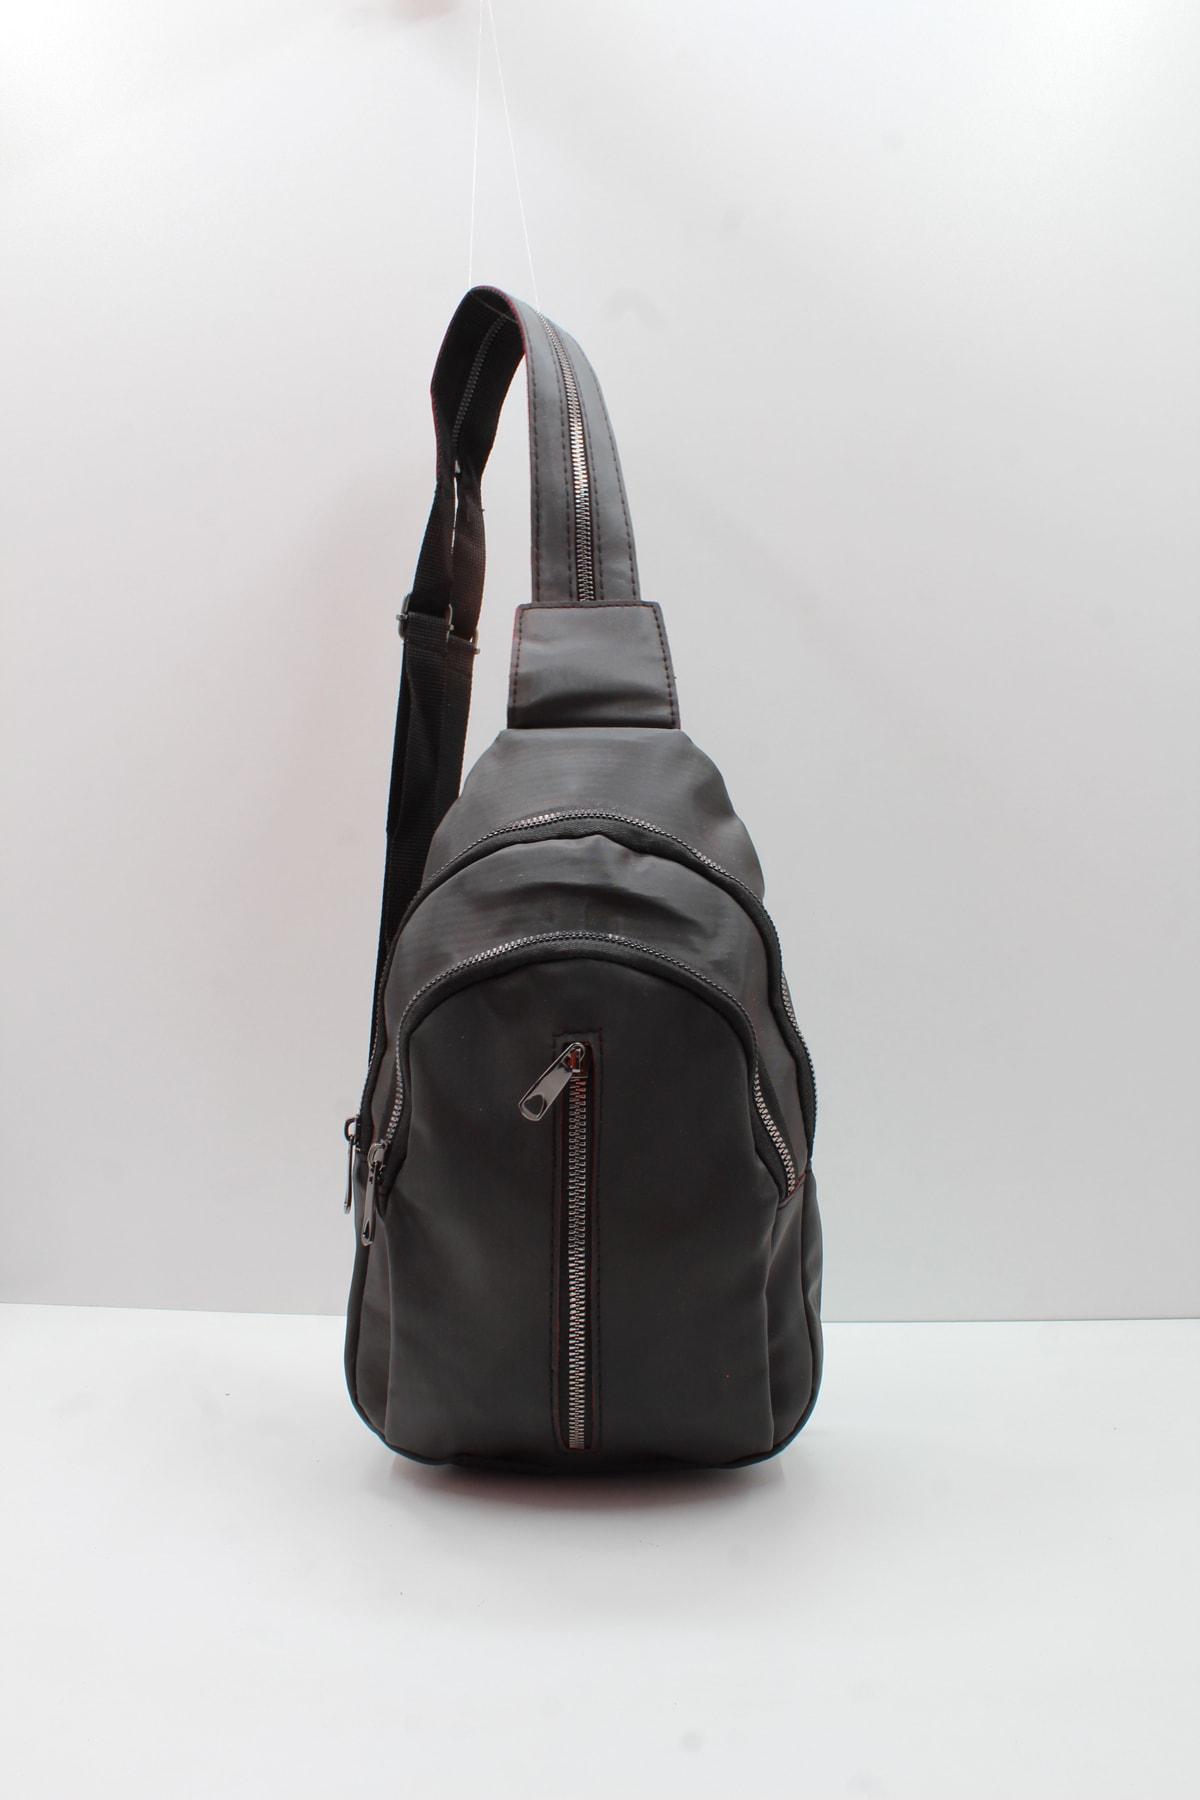 Women's Three-Eyed Satin Fabric Waist and Backpack сумка женская сумка через плечо bags for women Наплечные сумки шоппер bolsos